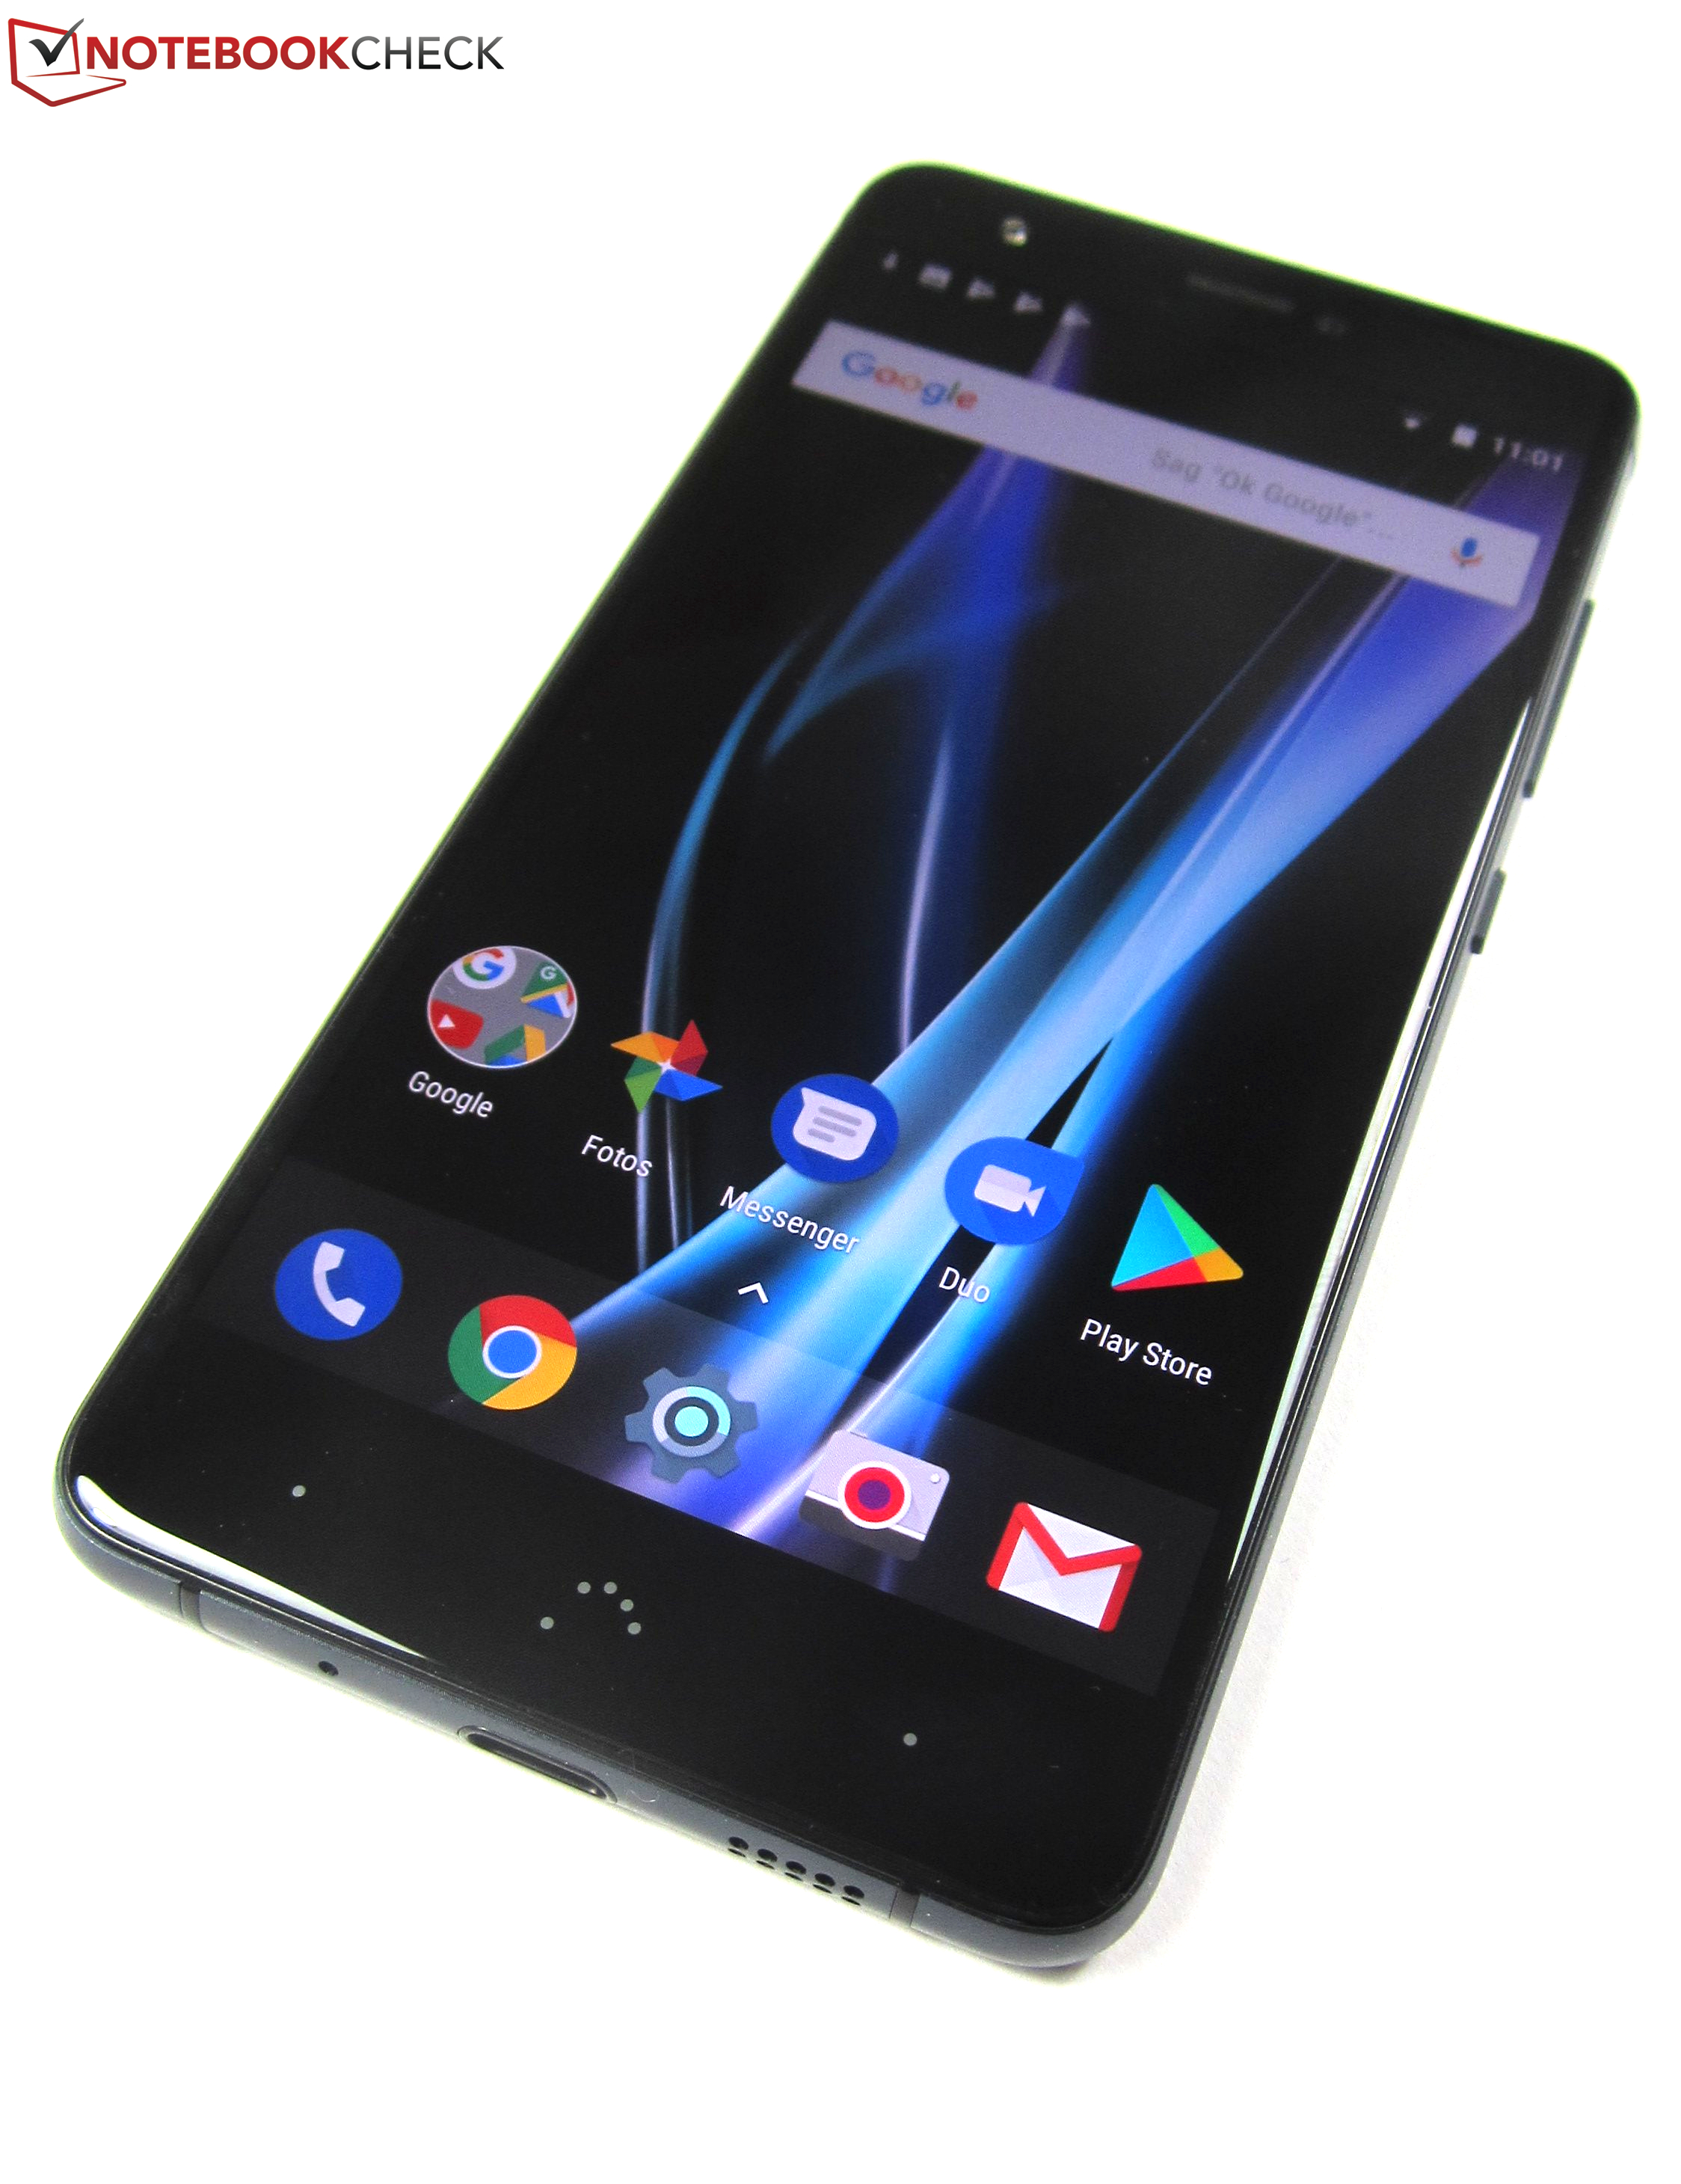 932ed8b471dcd7 BQ Aquaris X Pro Smartphone Review - NotebookCheck.net Reviews